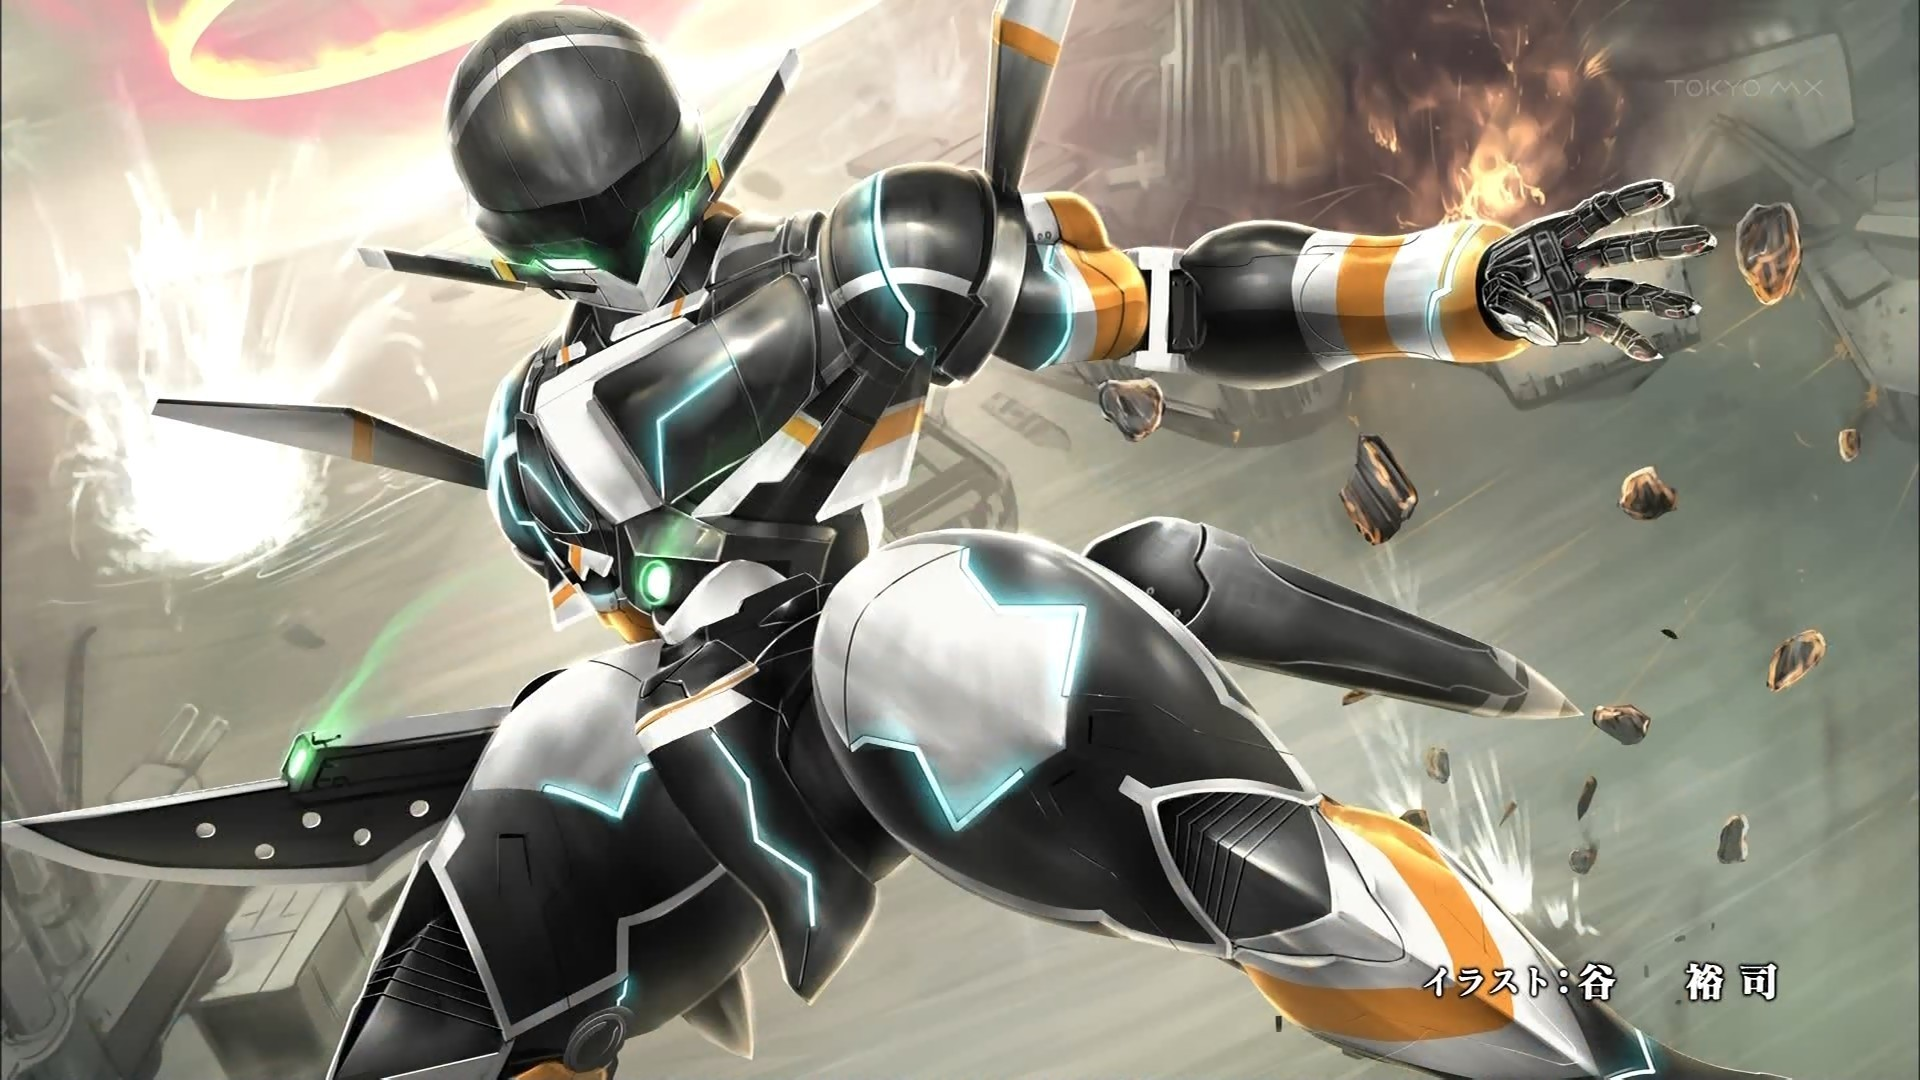 Suisei No Gargantia, Anime, Mech, Chamber (Suisei No Gargantia) Wallpapers  HD / Desktop and Mobile Backgrounds